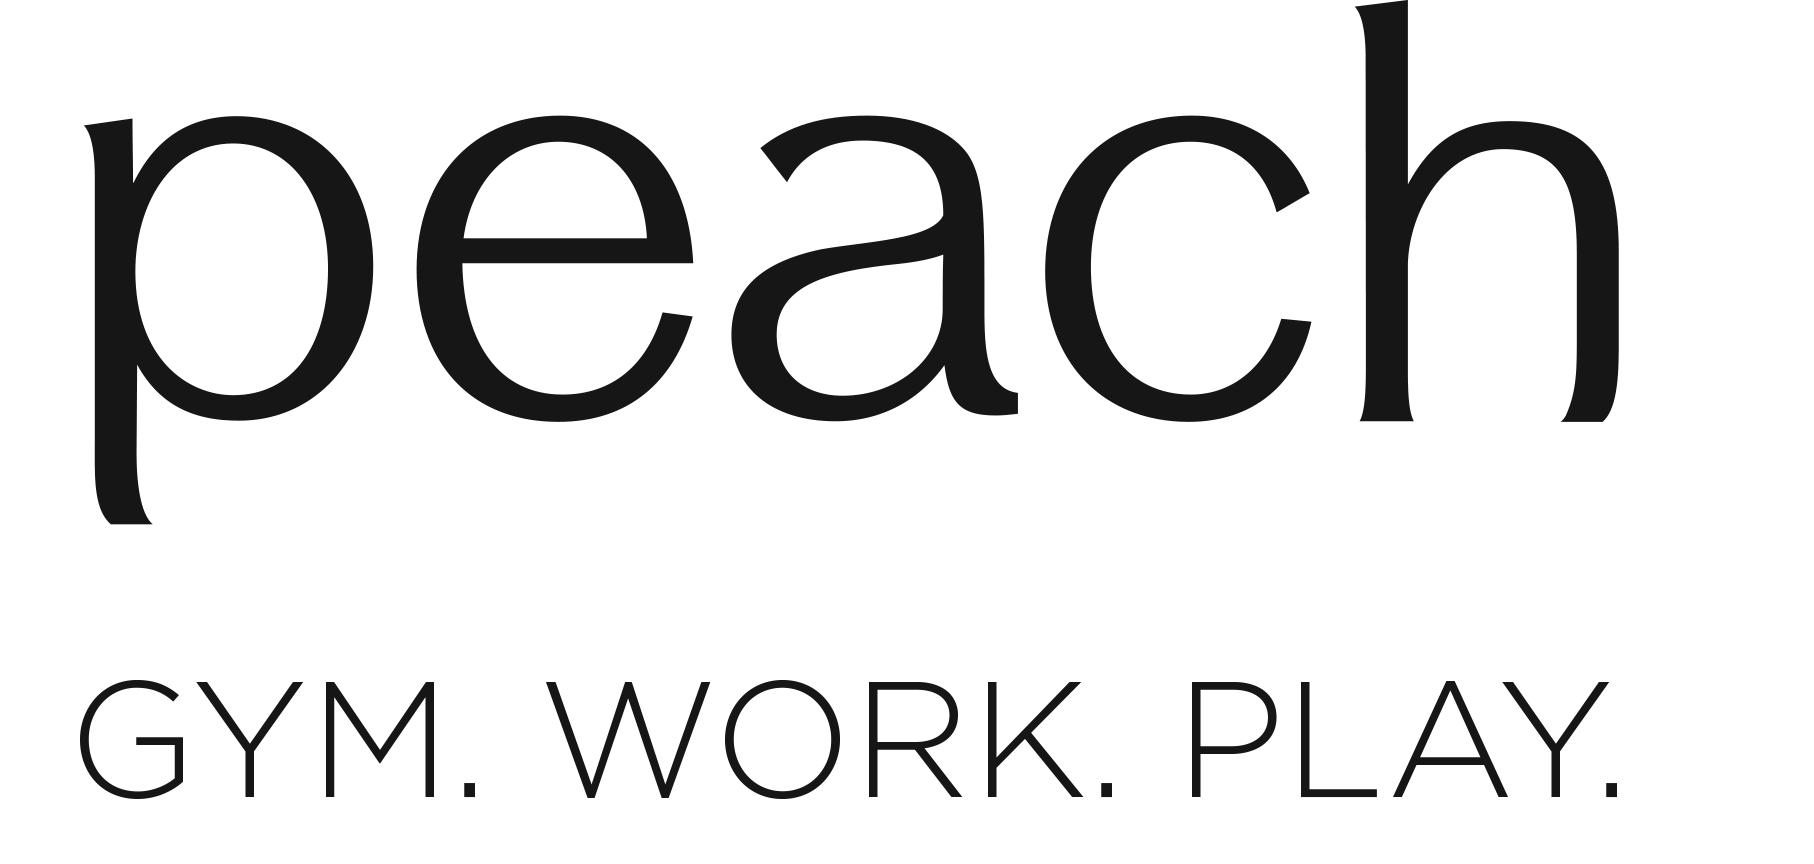 Peach gym work play logo transparent  (1).png